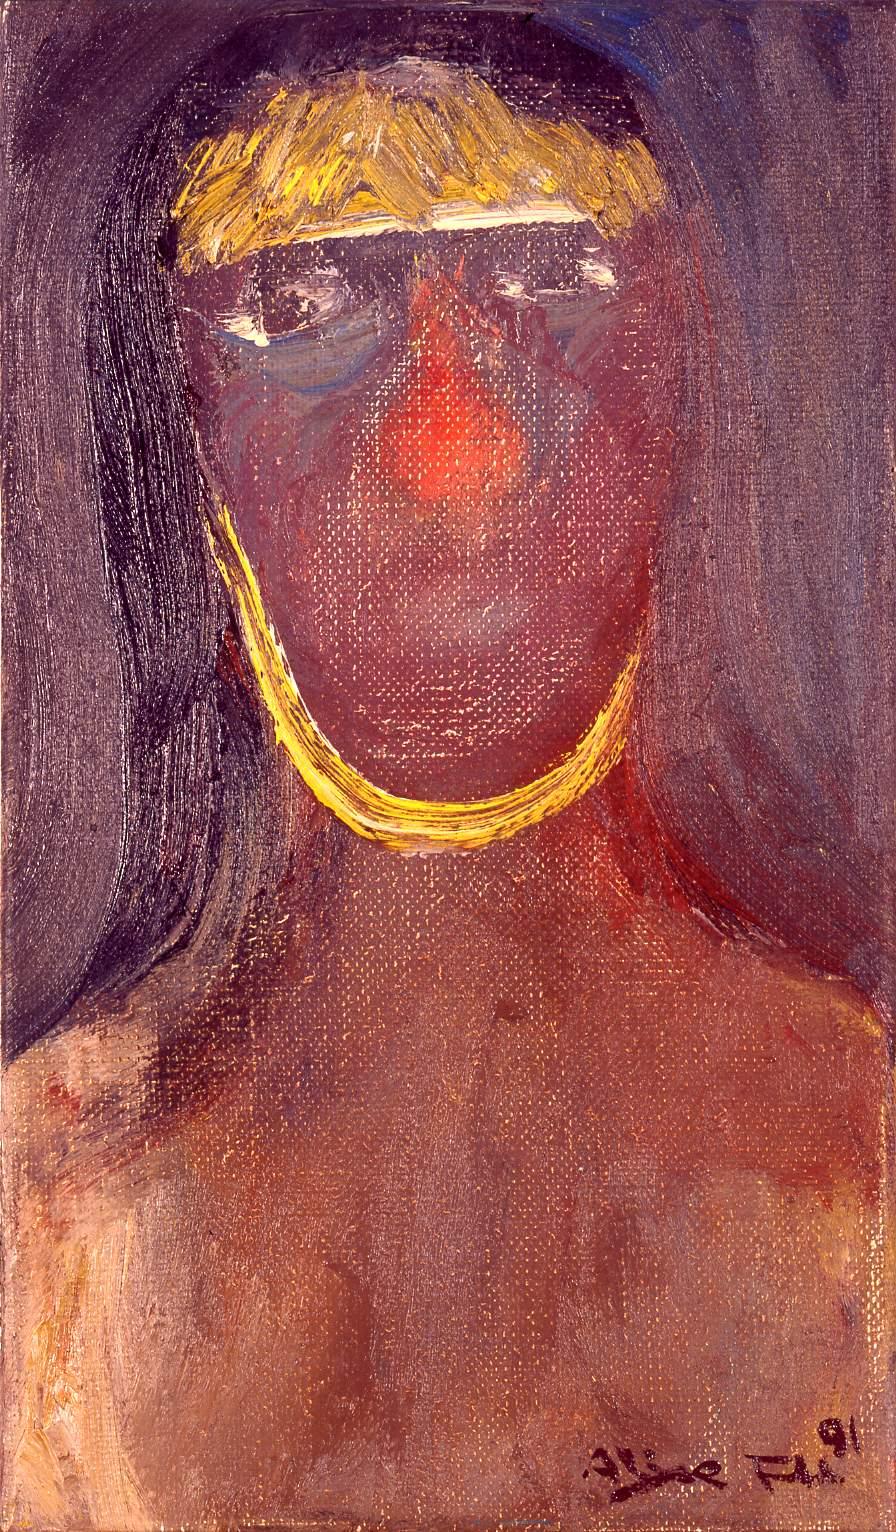 Alixe Fu, 印第安女人 Indian Woman, 1991